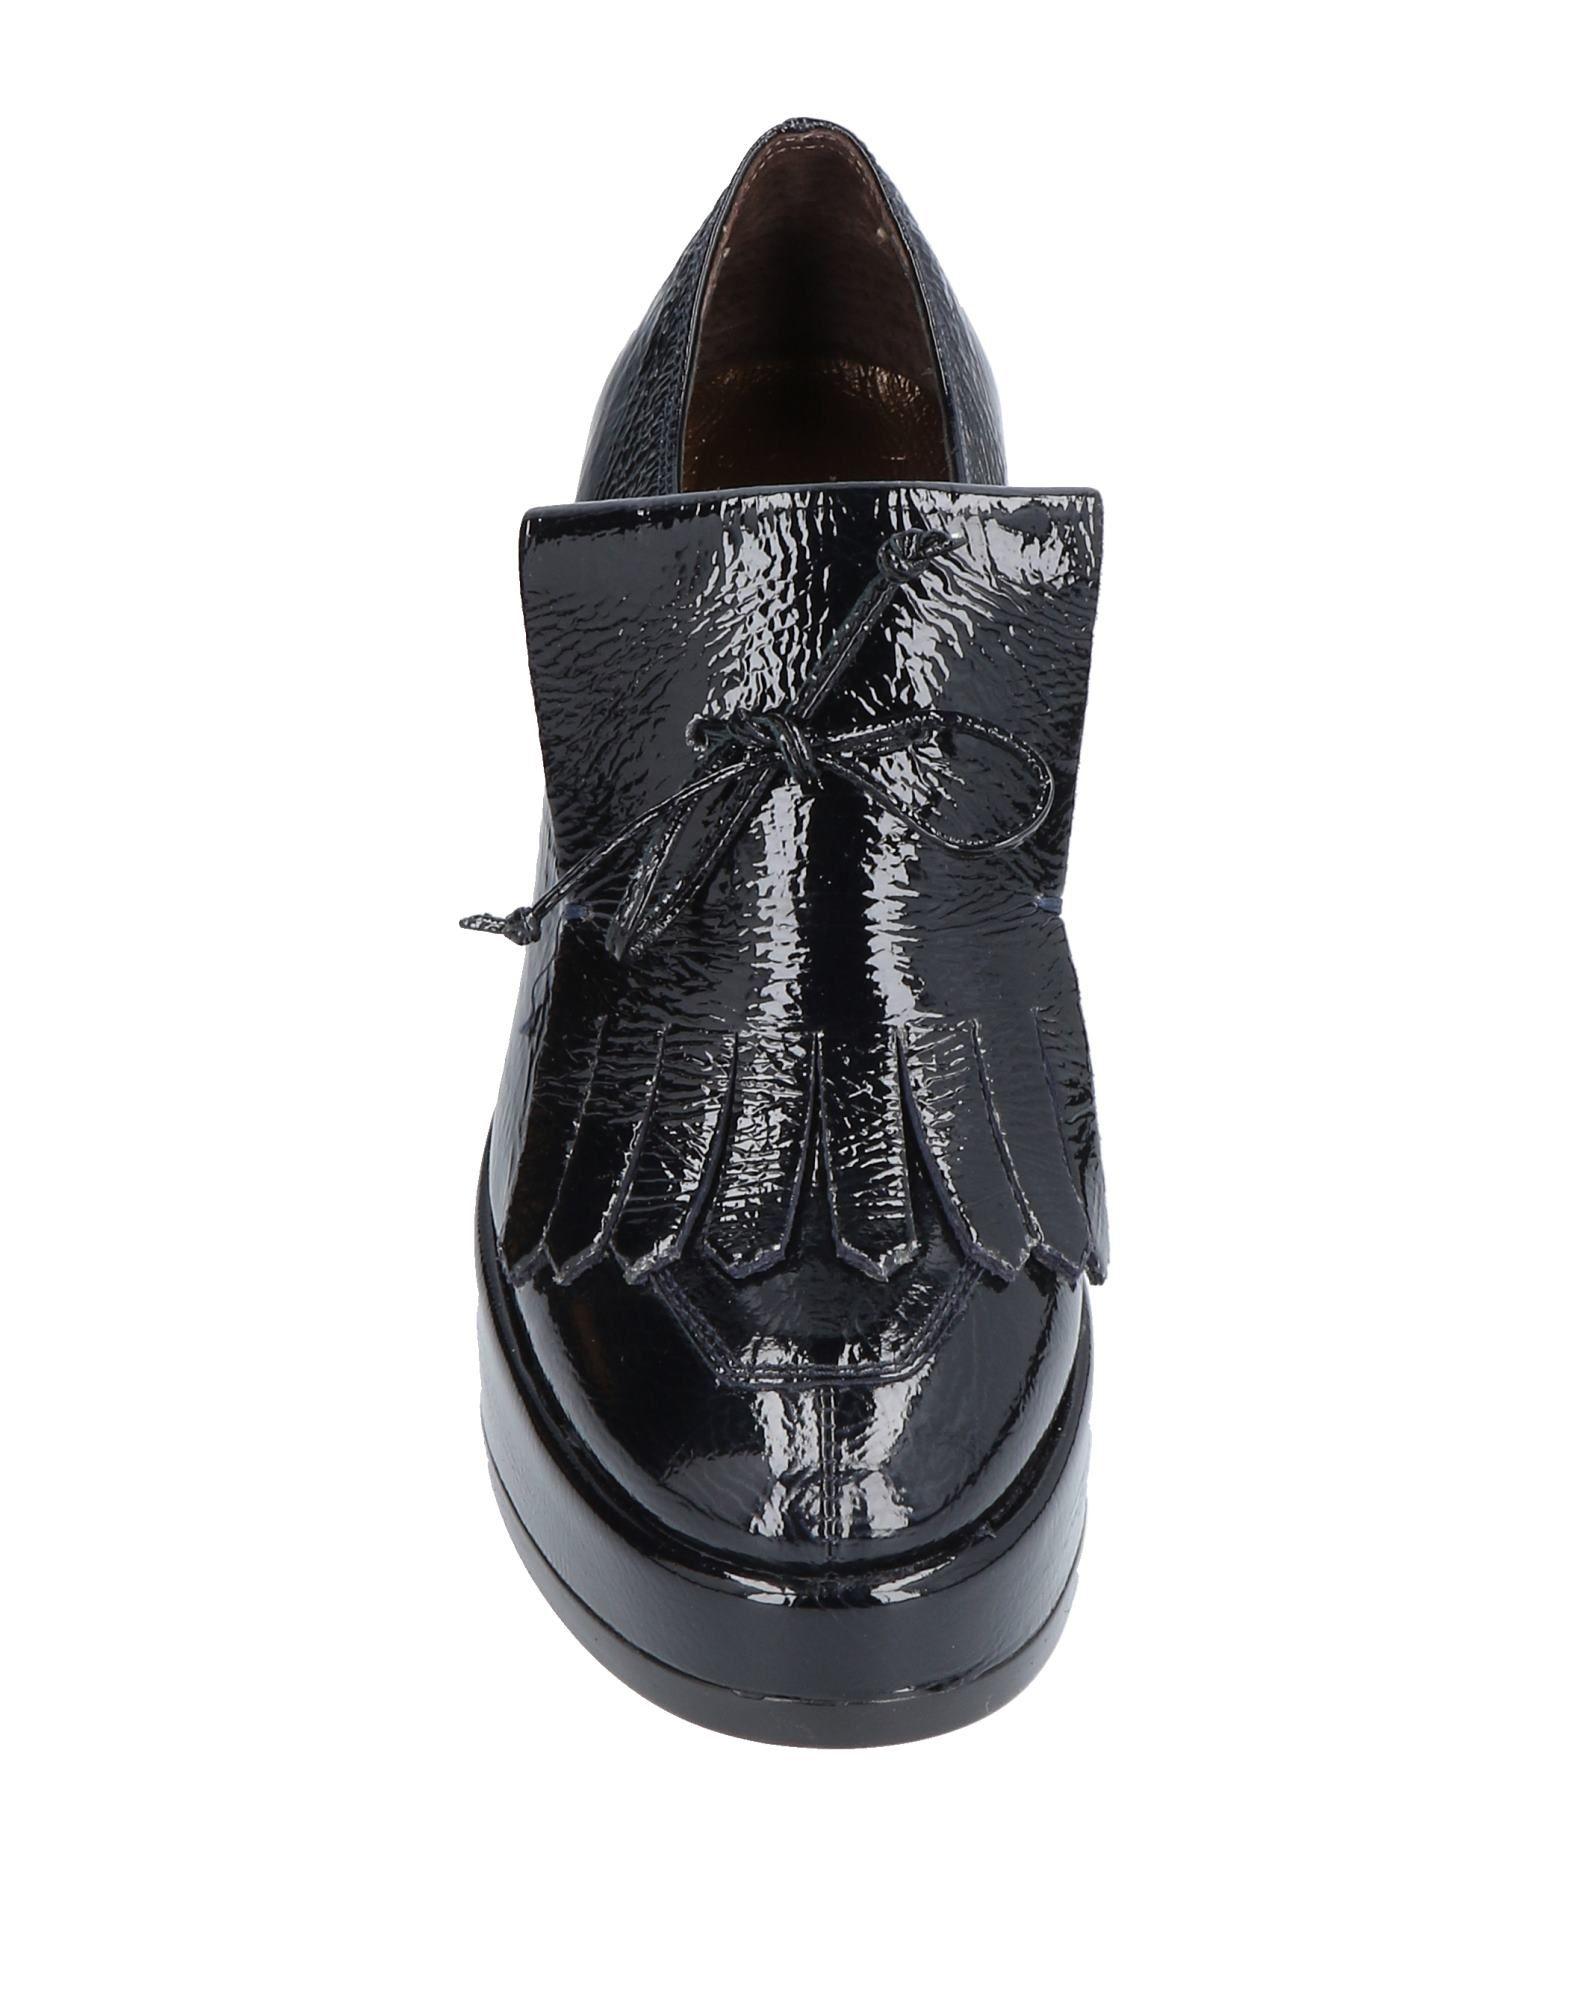 Pf16 Mokassins Damen  11488471UW Gute Qualität beliebte Schuhe